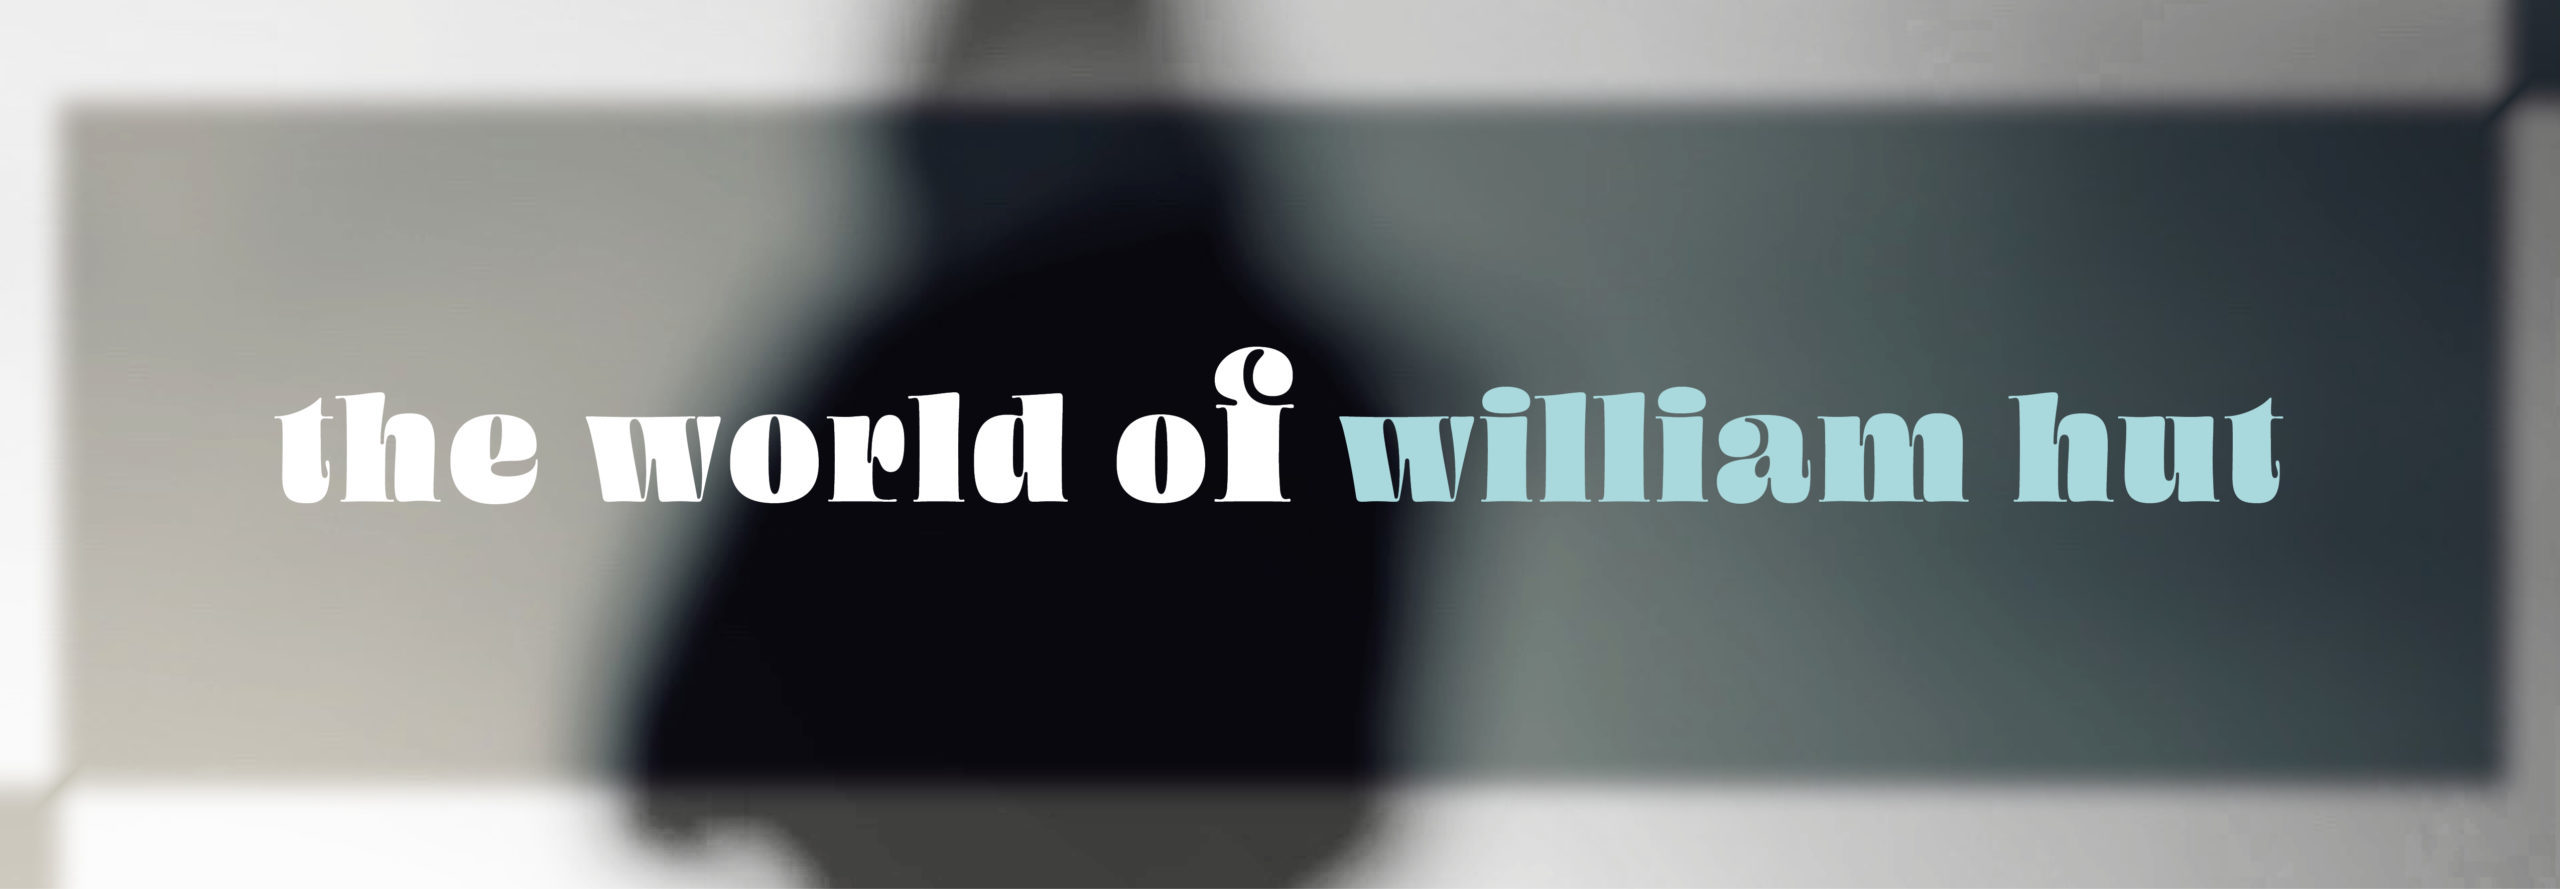 The World of William Hut